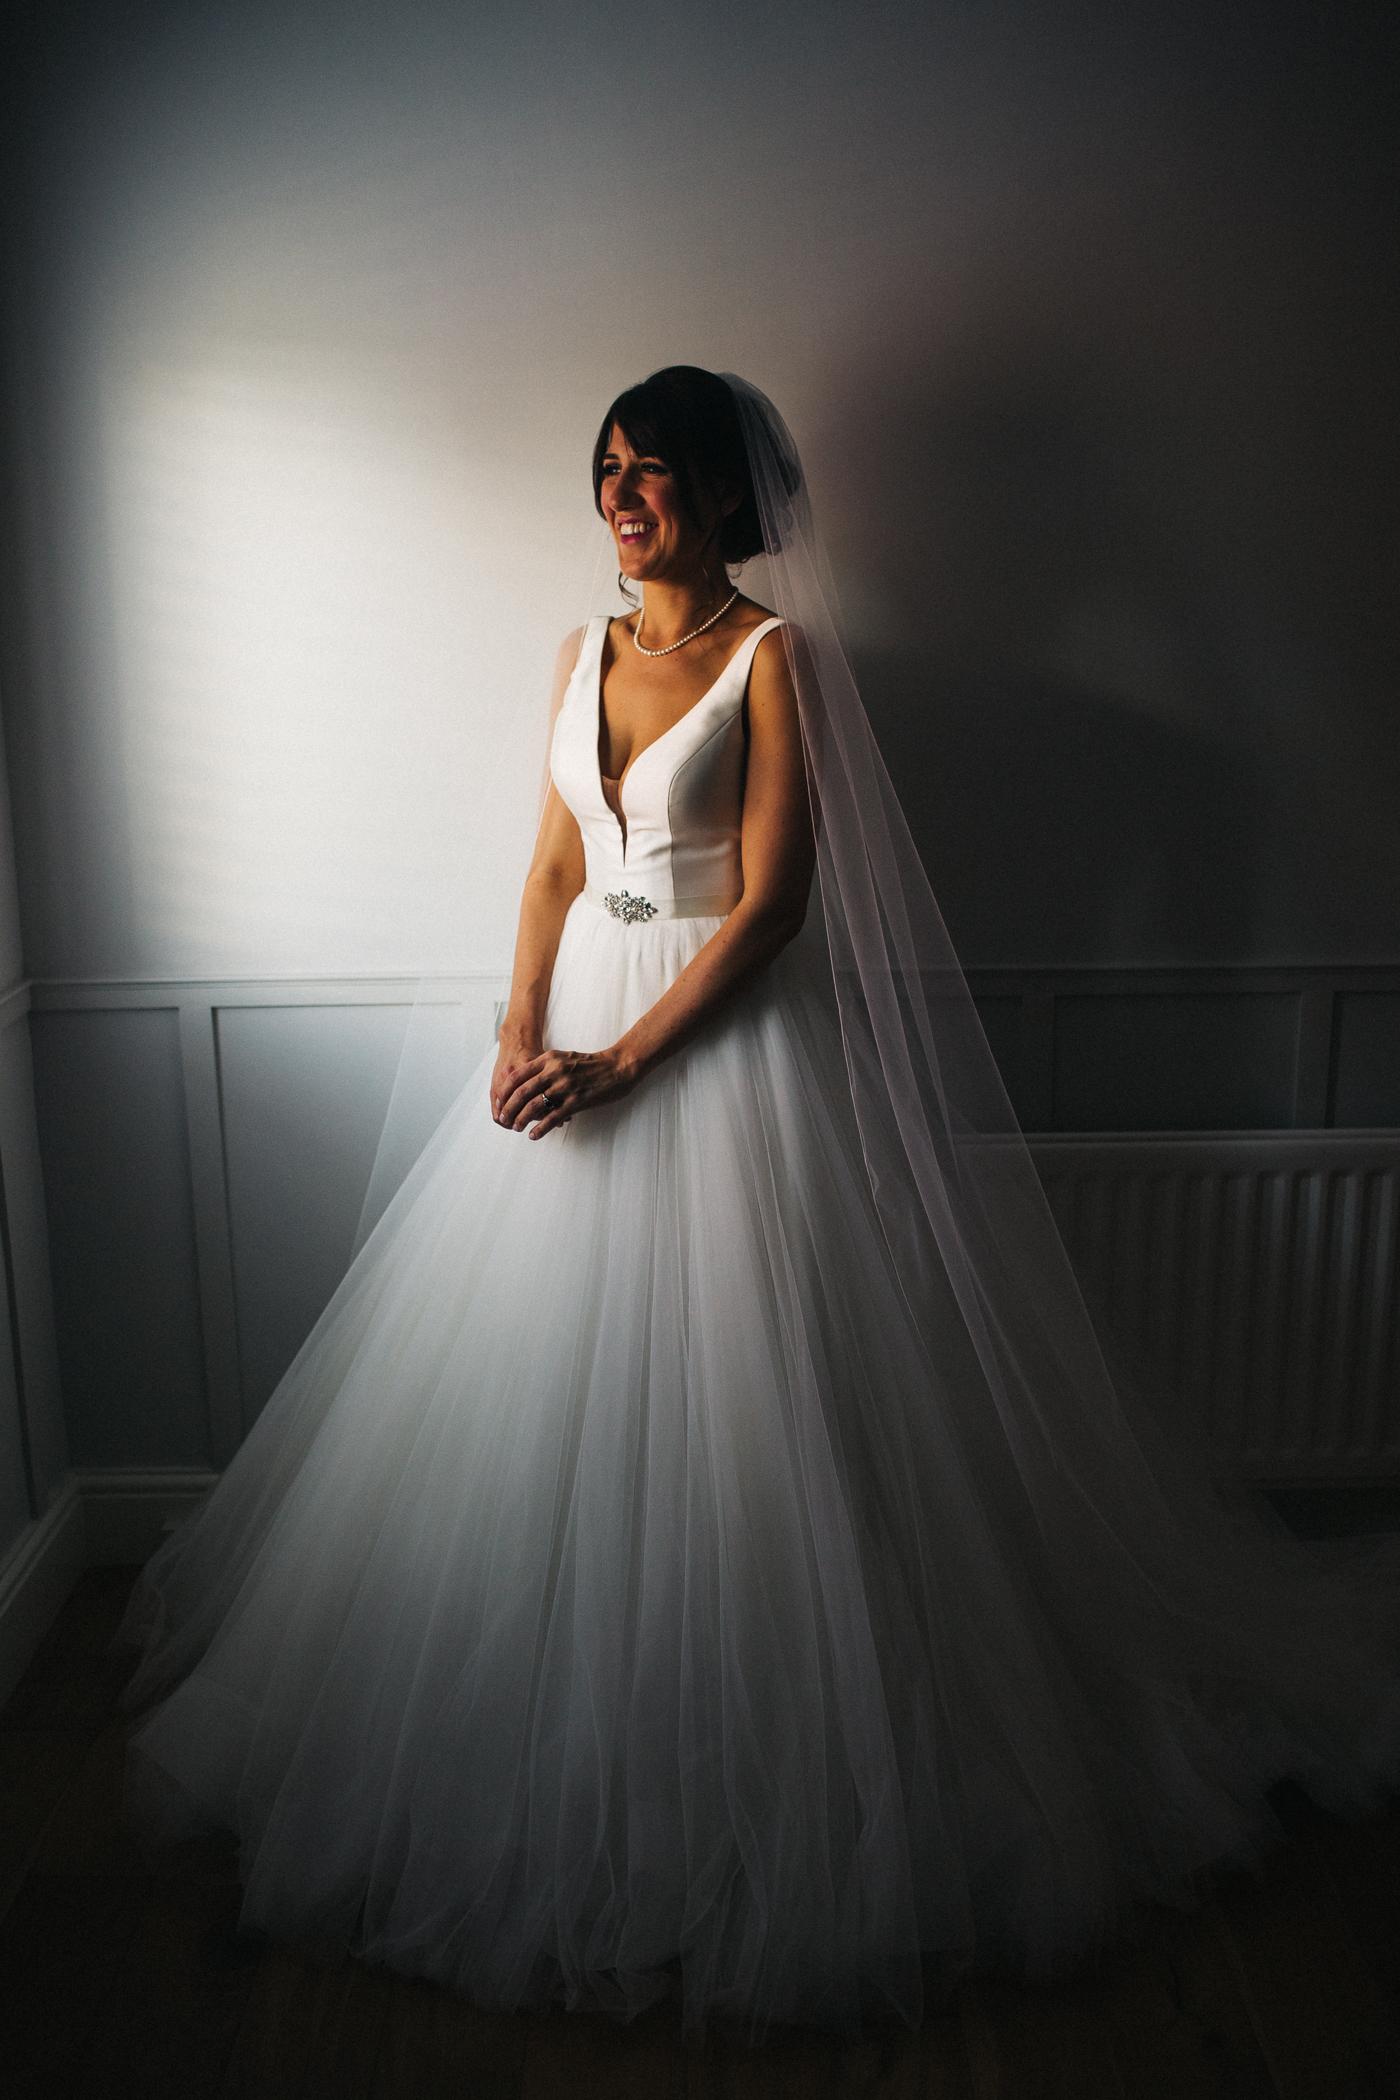 york-house-malton-wedding-photographer-north-yorkshire-0010.jpg